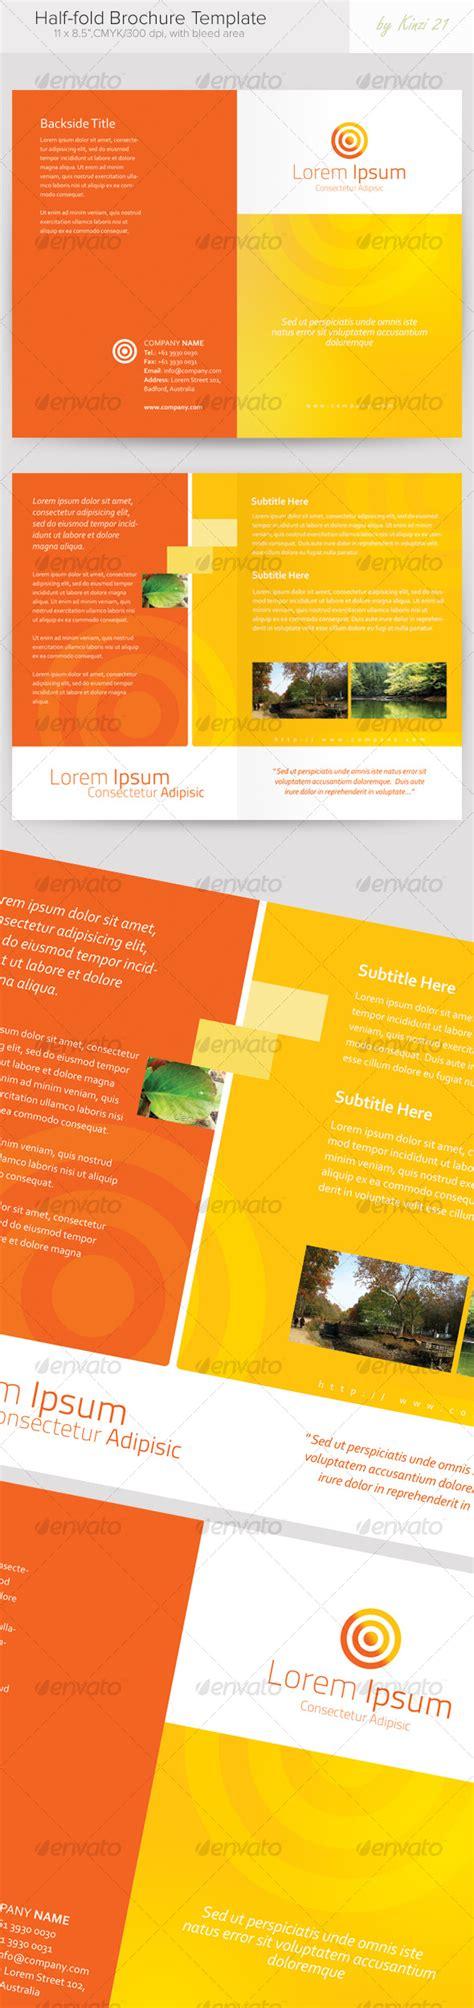 Half Fold Brochure Template Graphicriver Half Fold Brochure Template